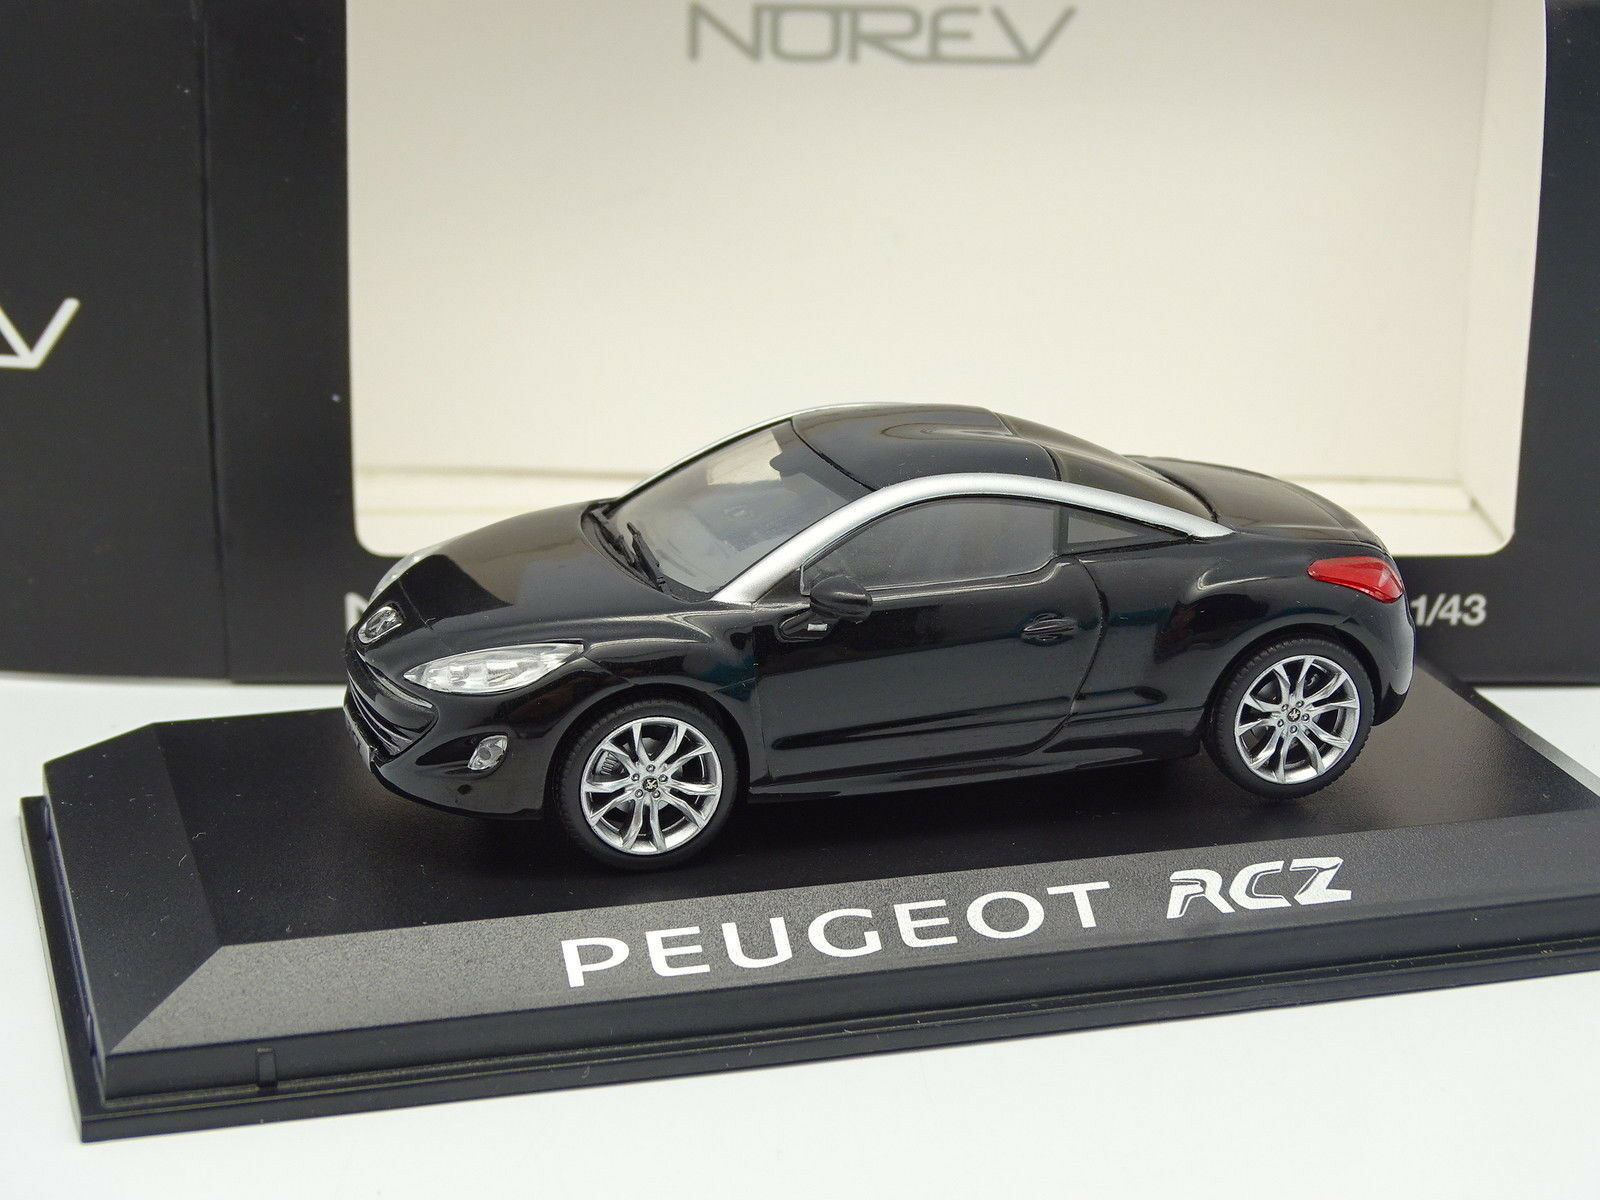 Norev 1 43 - Peugeot RCZ black